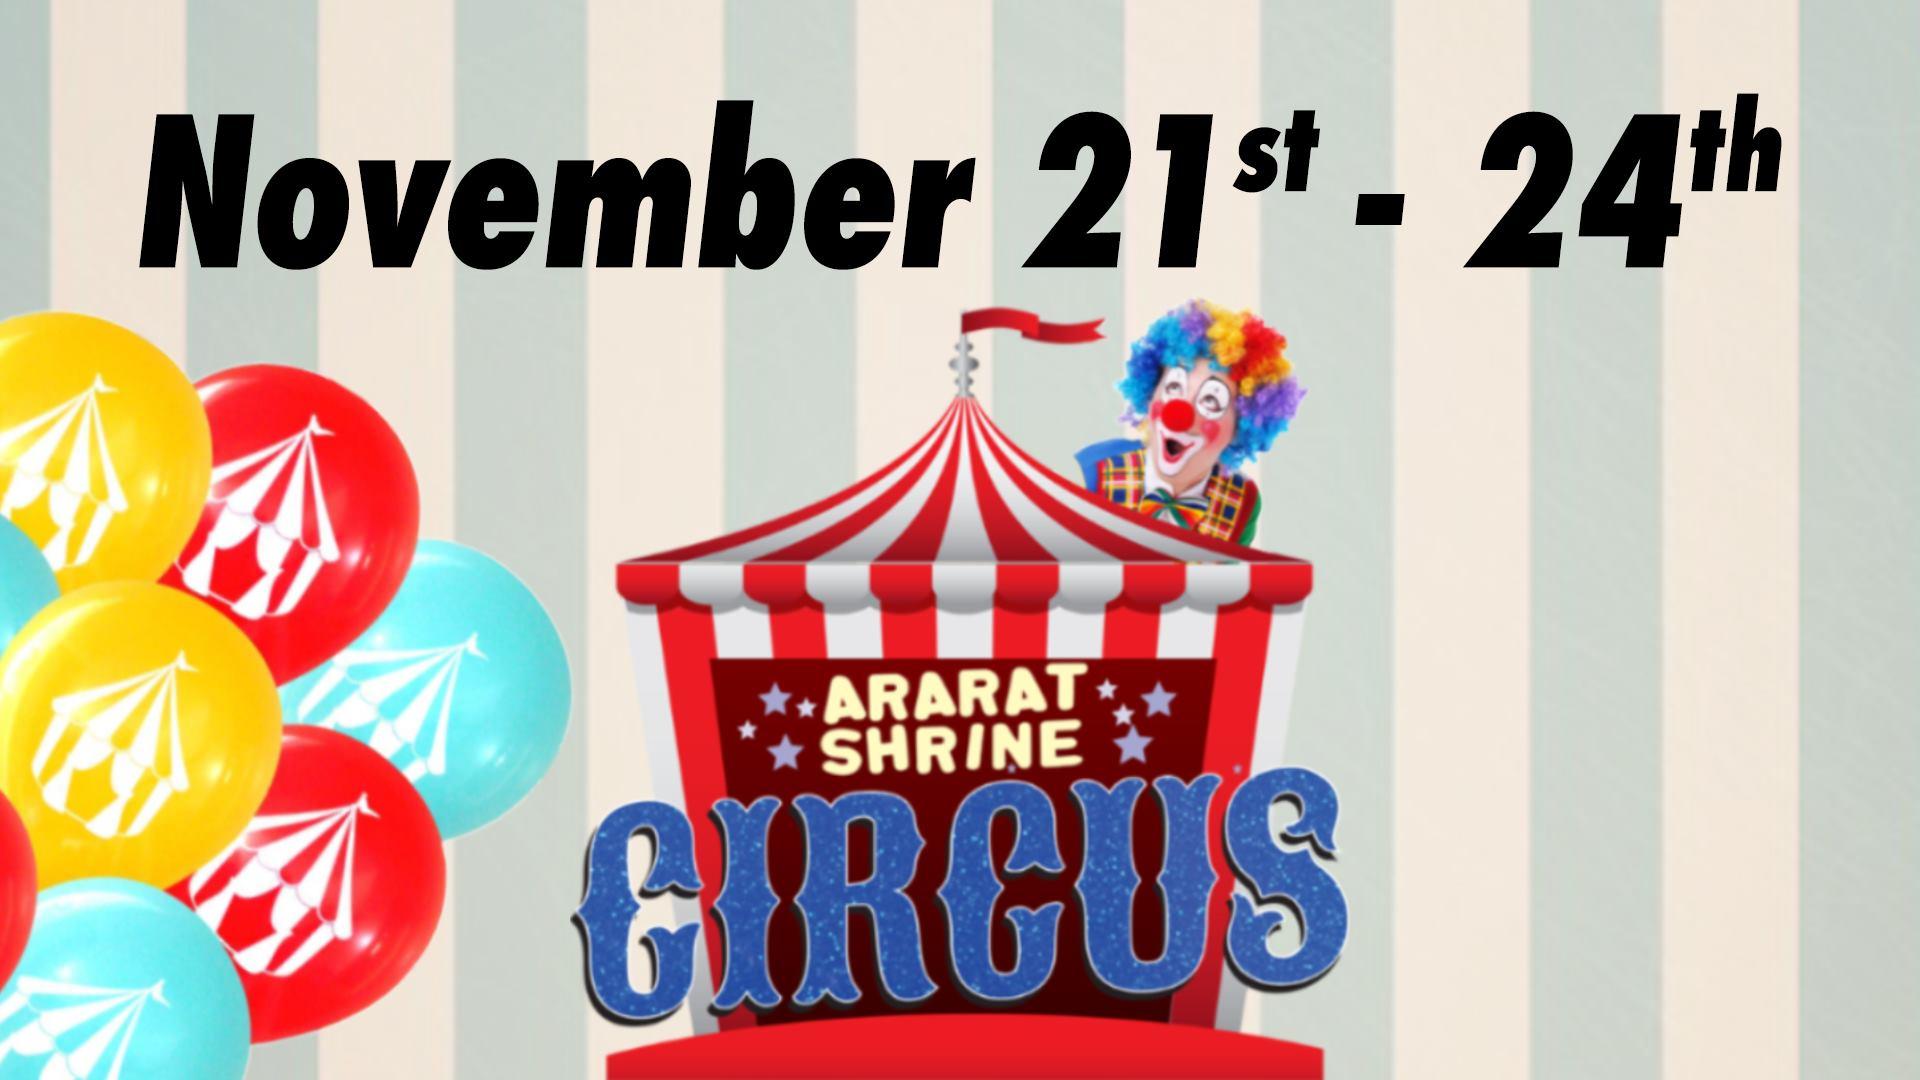 The 84th Annual Ararat Shrine Circus